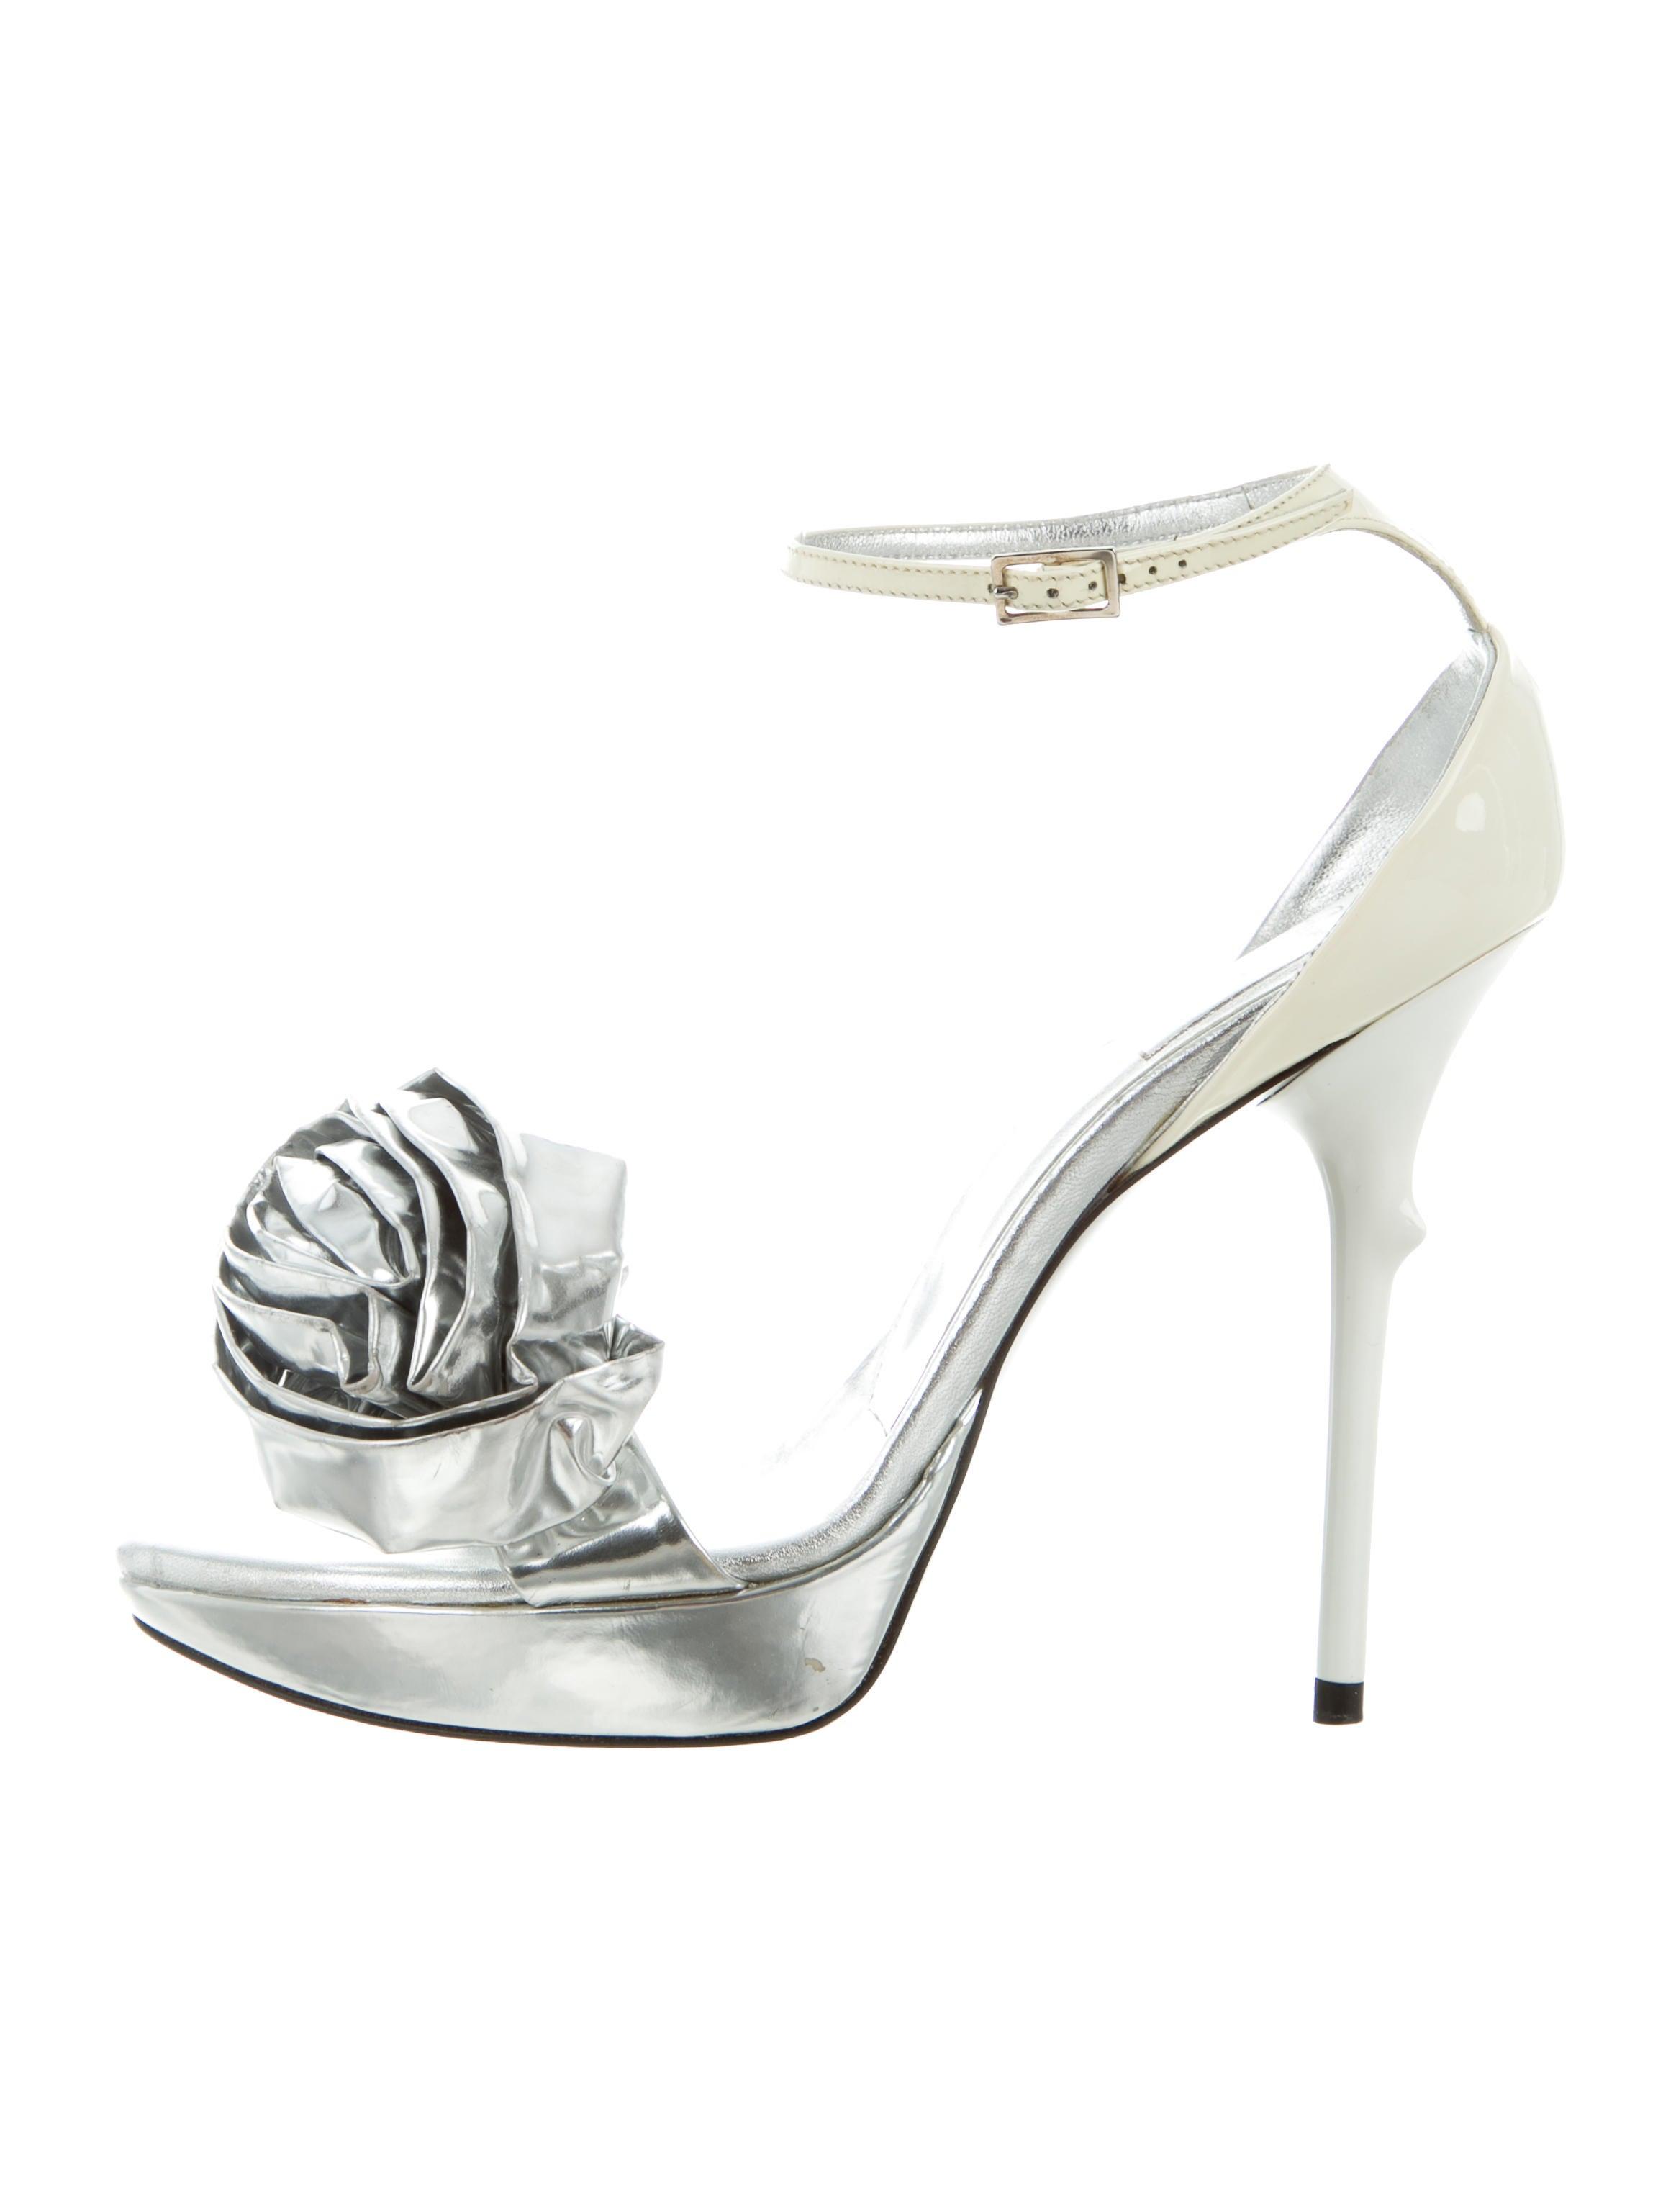 sale big discount Roger Vivier Metallic Ankle Strap Sandals buy cheap buy outlet purchase discount 2014 KijSsudt